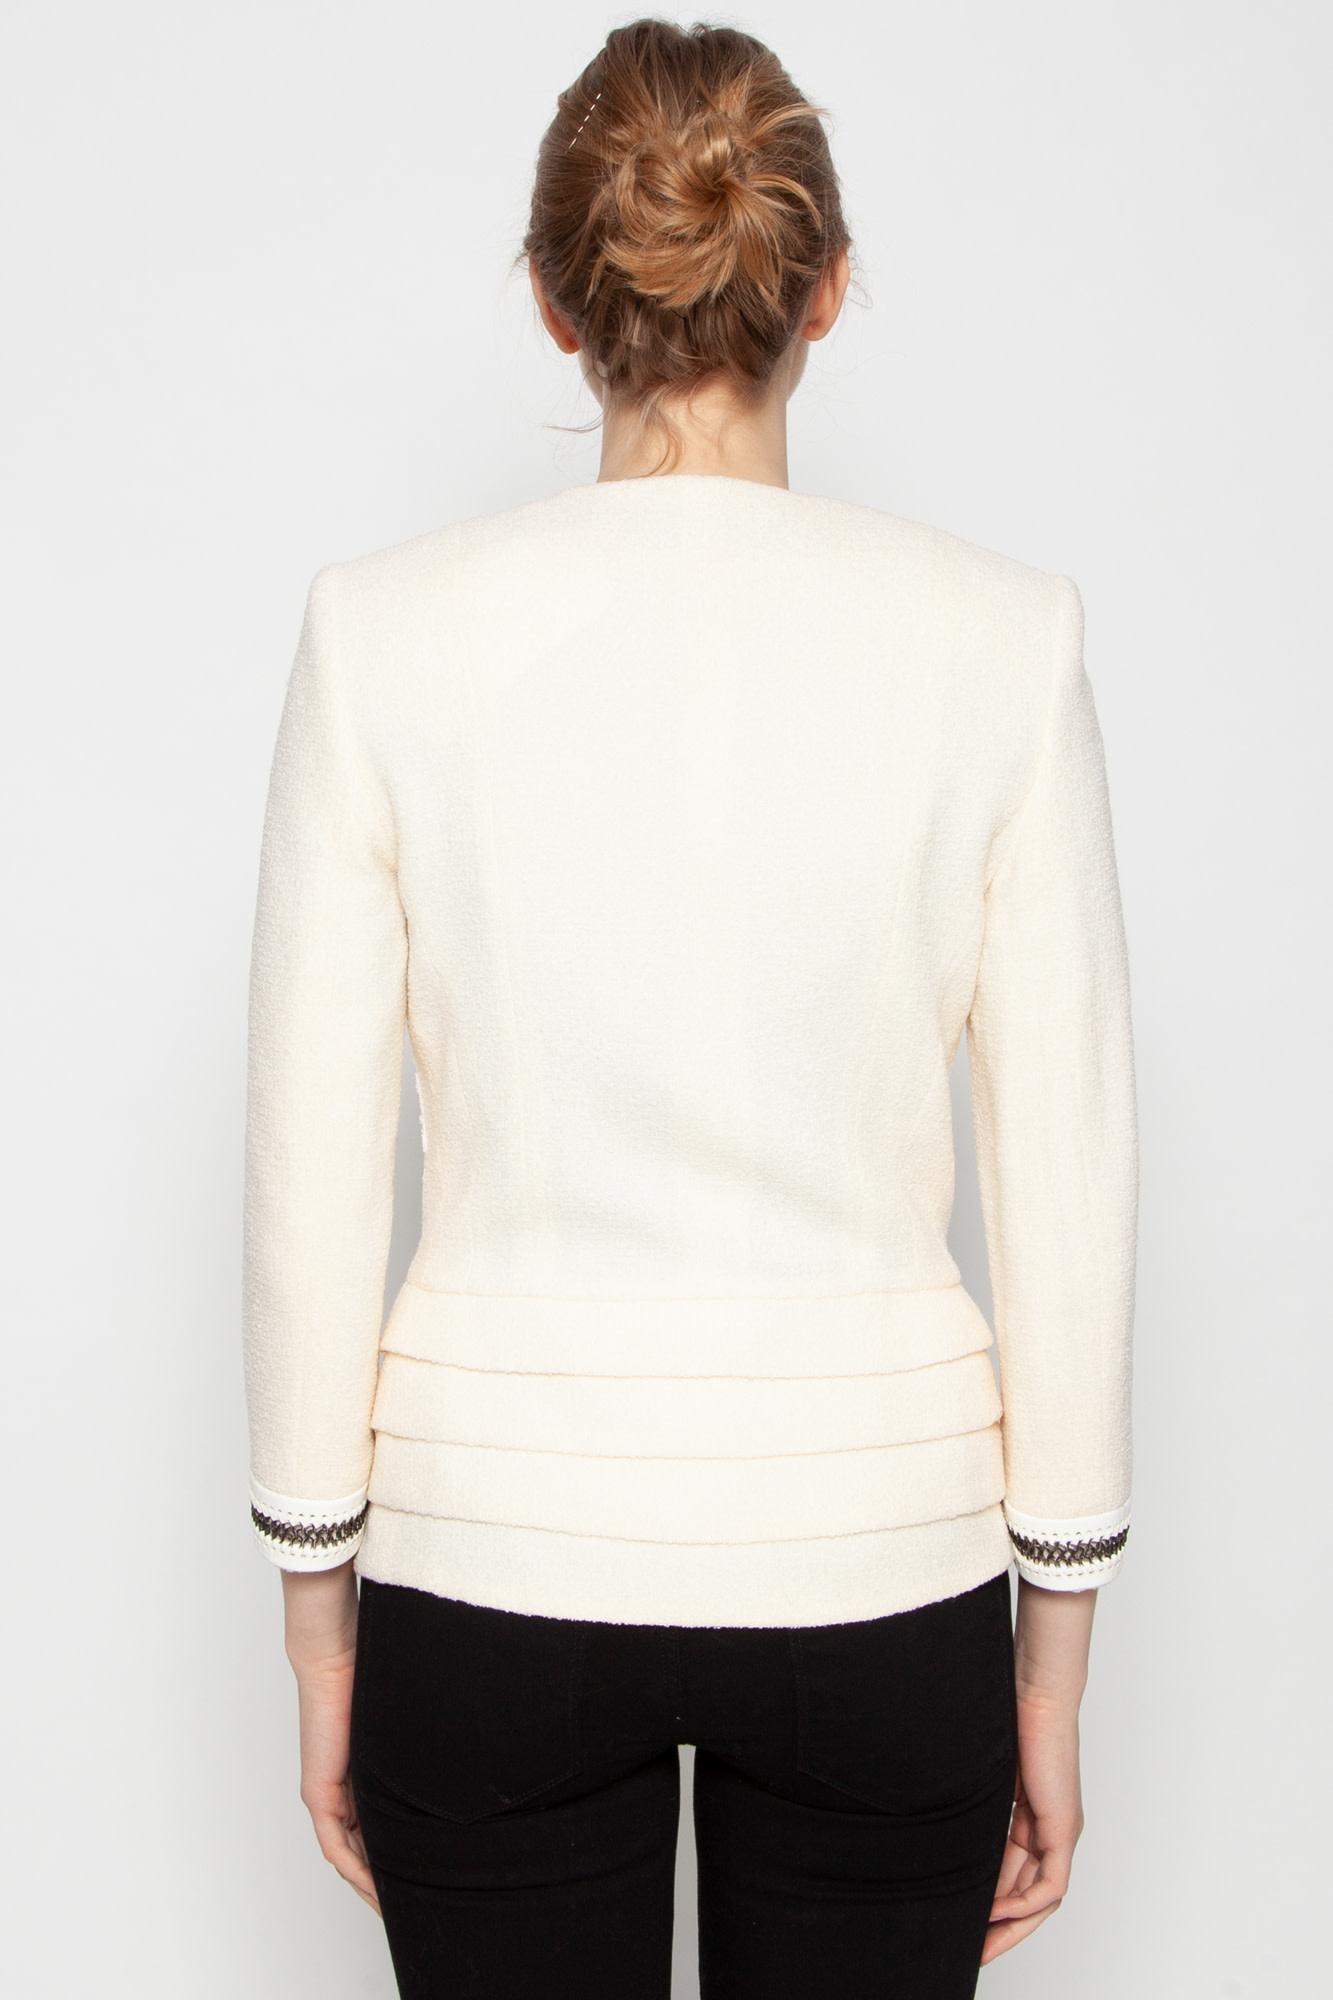 Christian Dior OFF-WHITE  LACE BLAZER